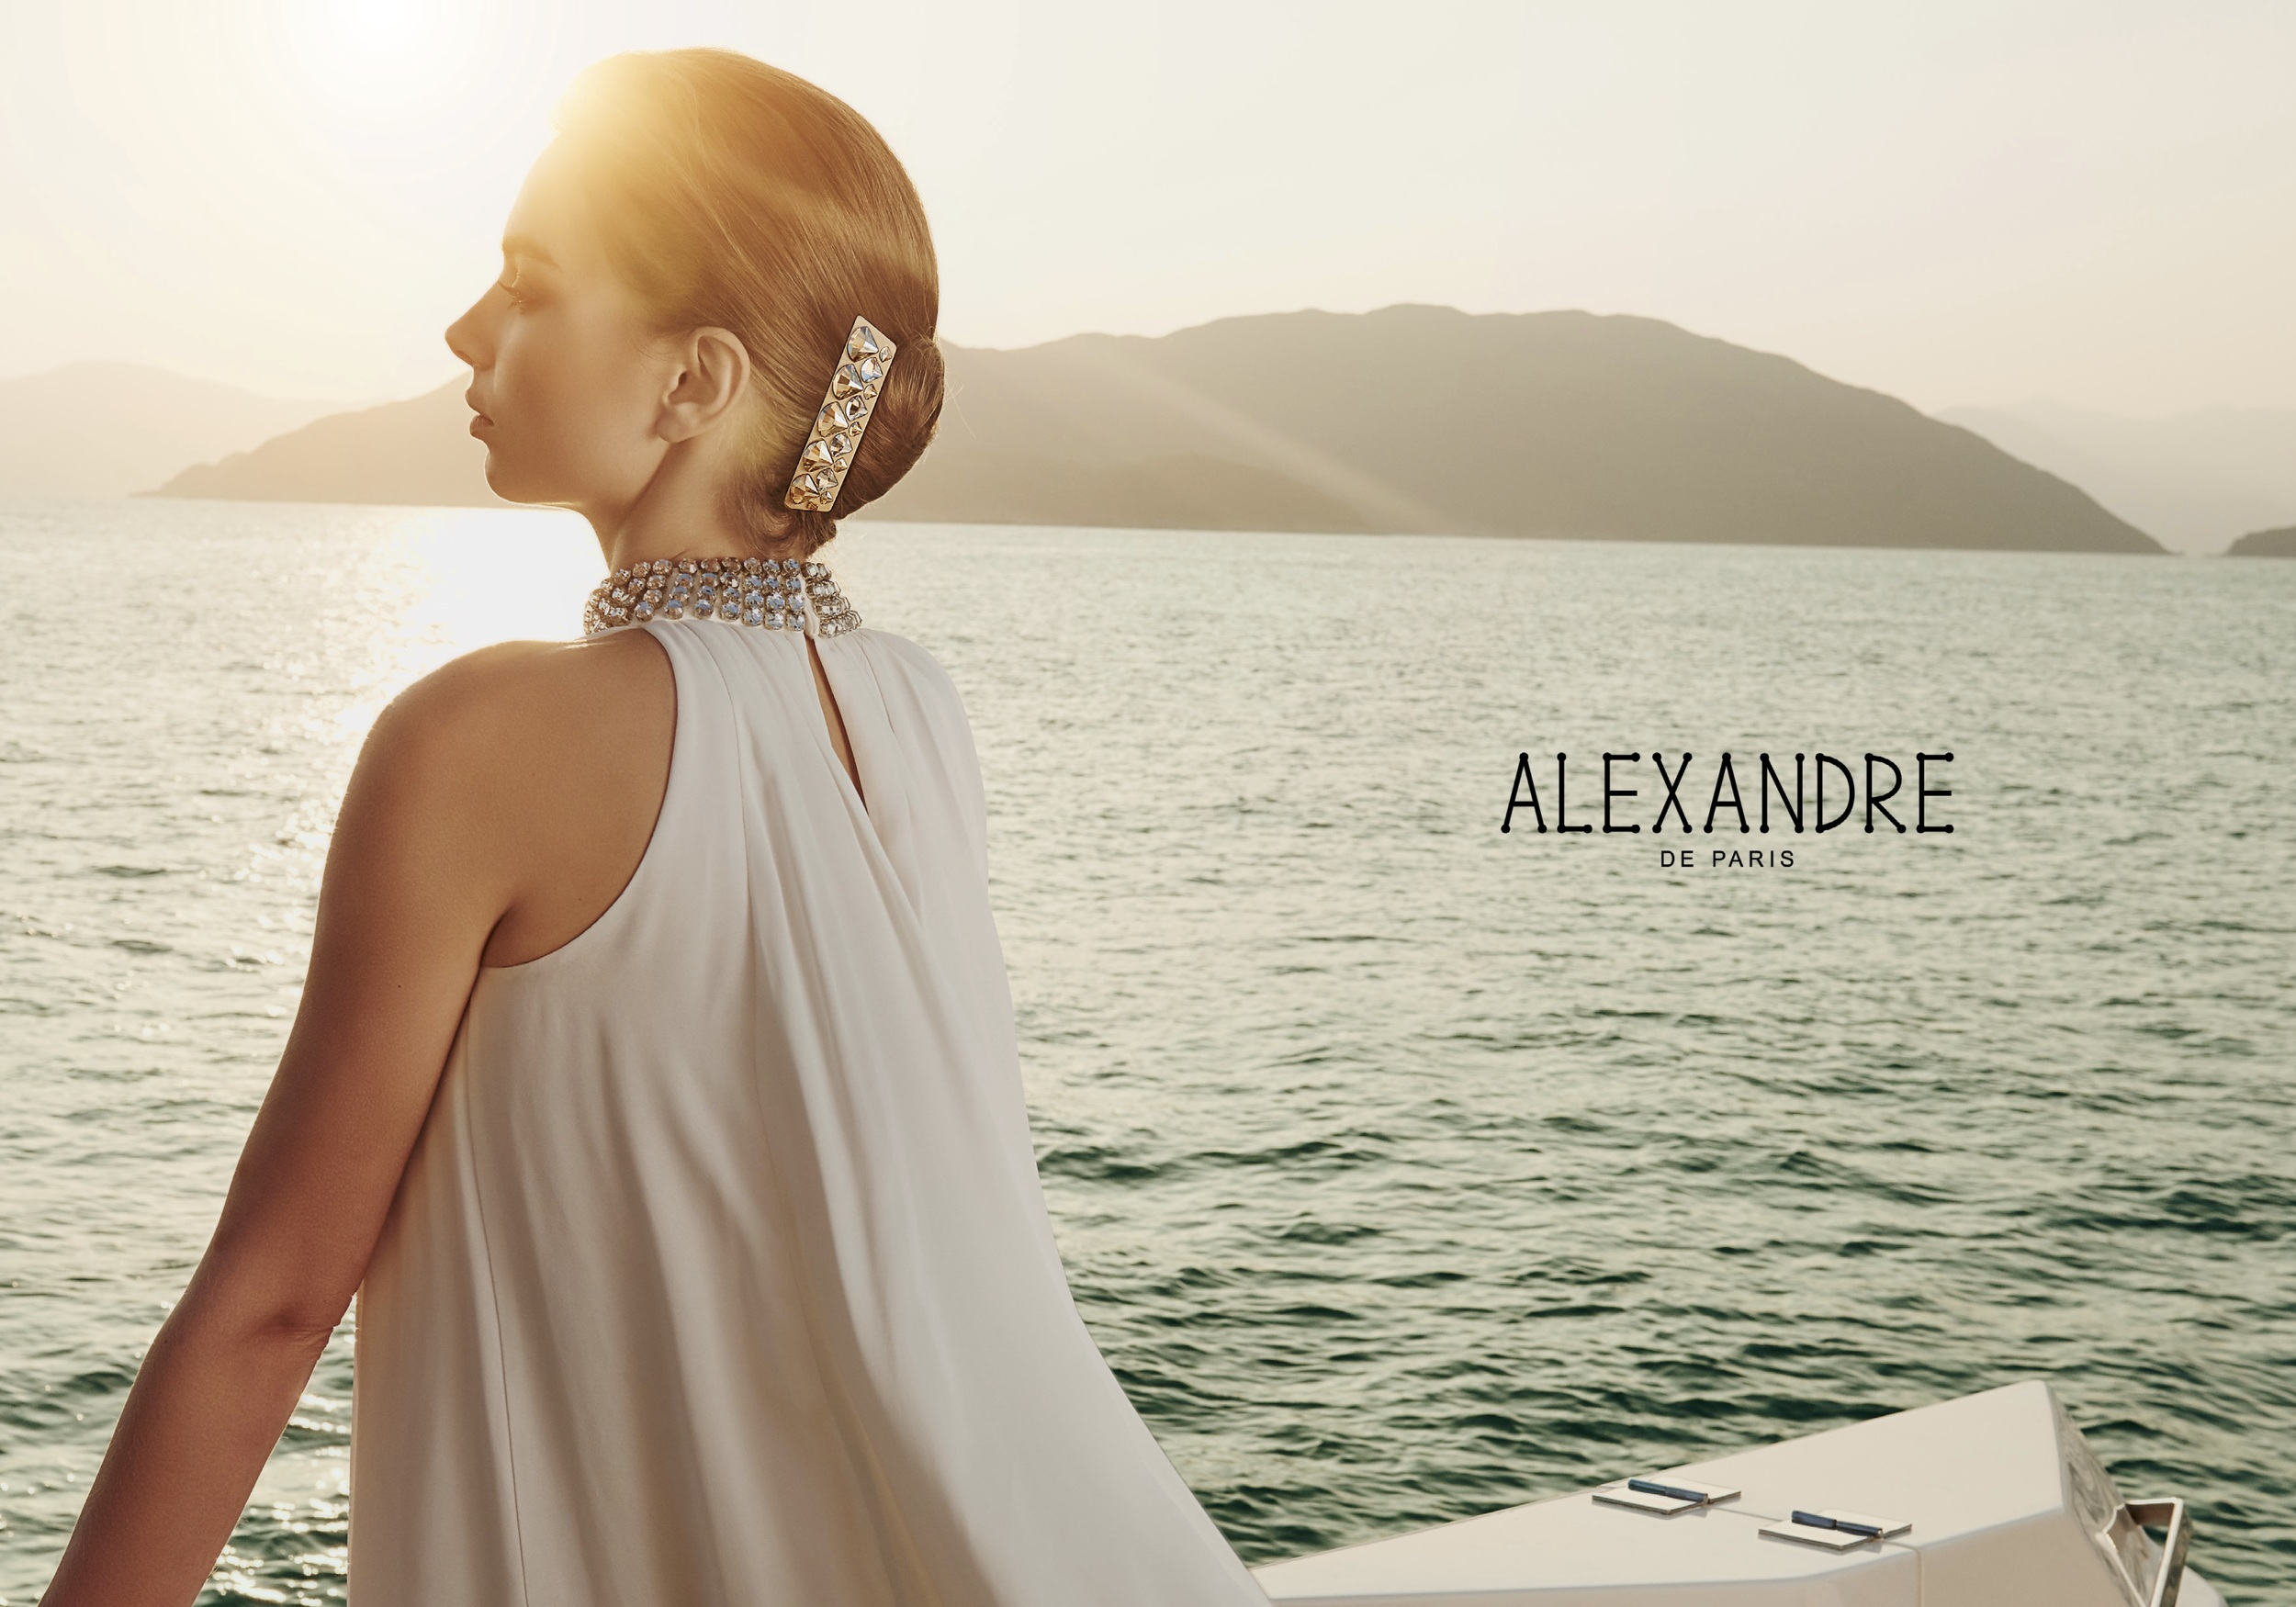 AlexandreDeParisweb14.jpg